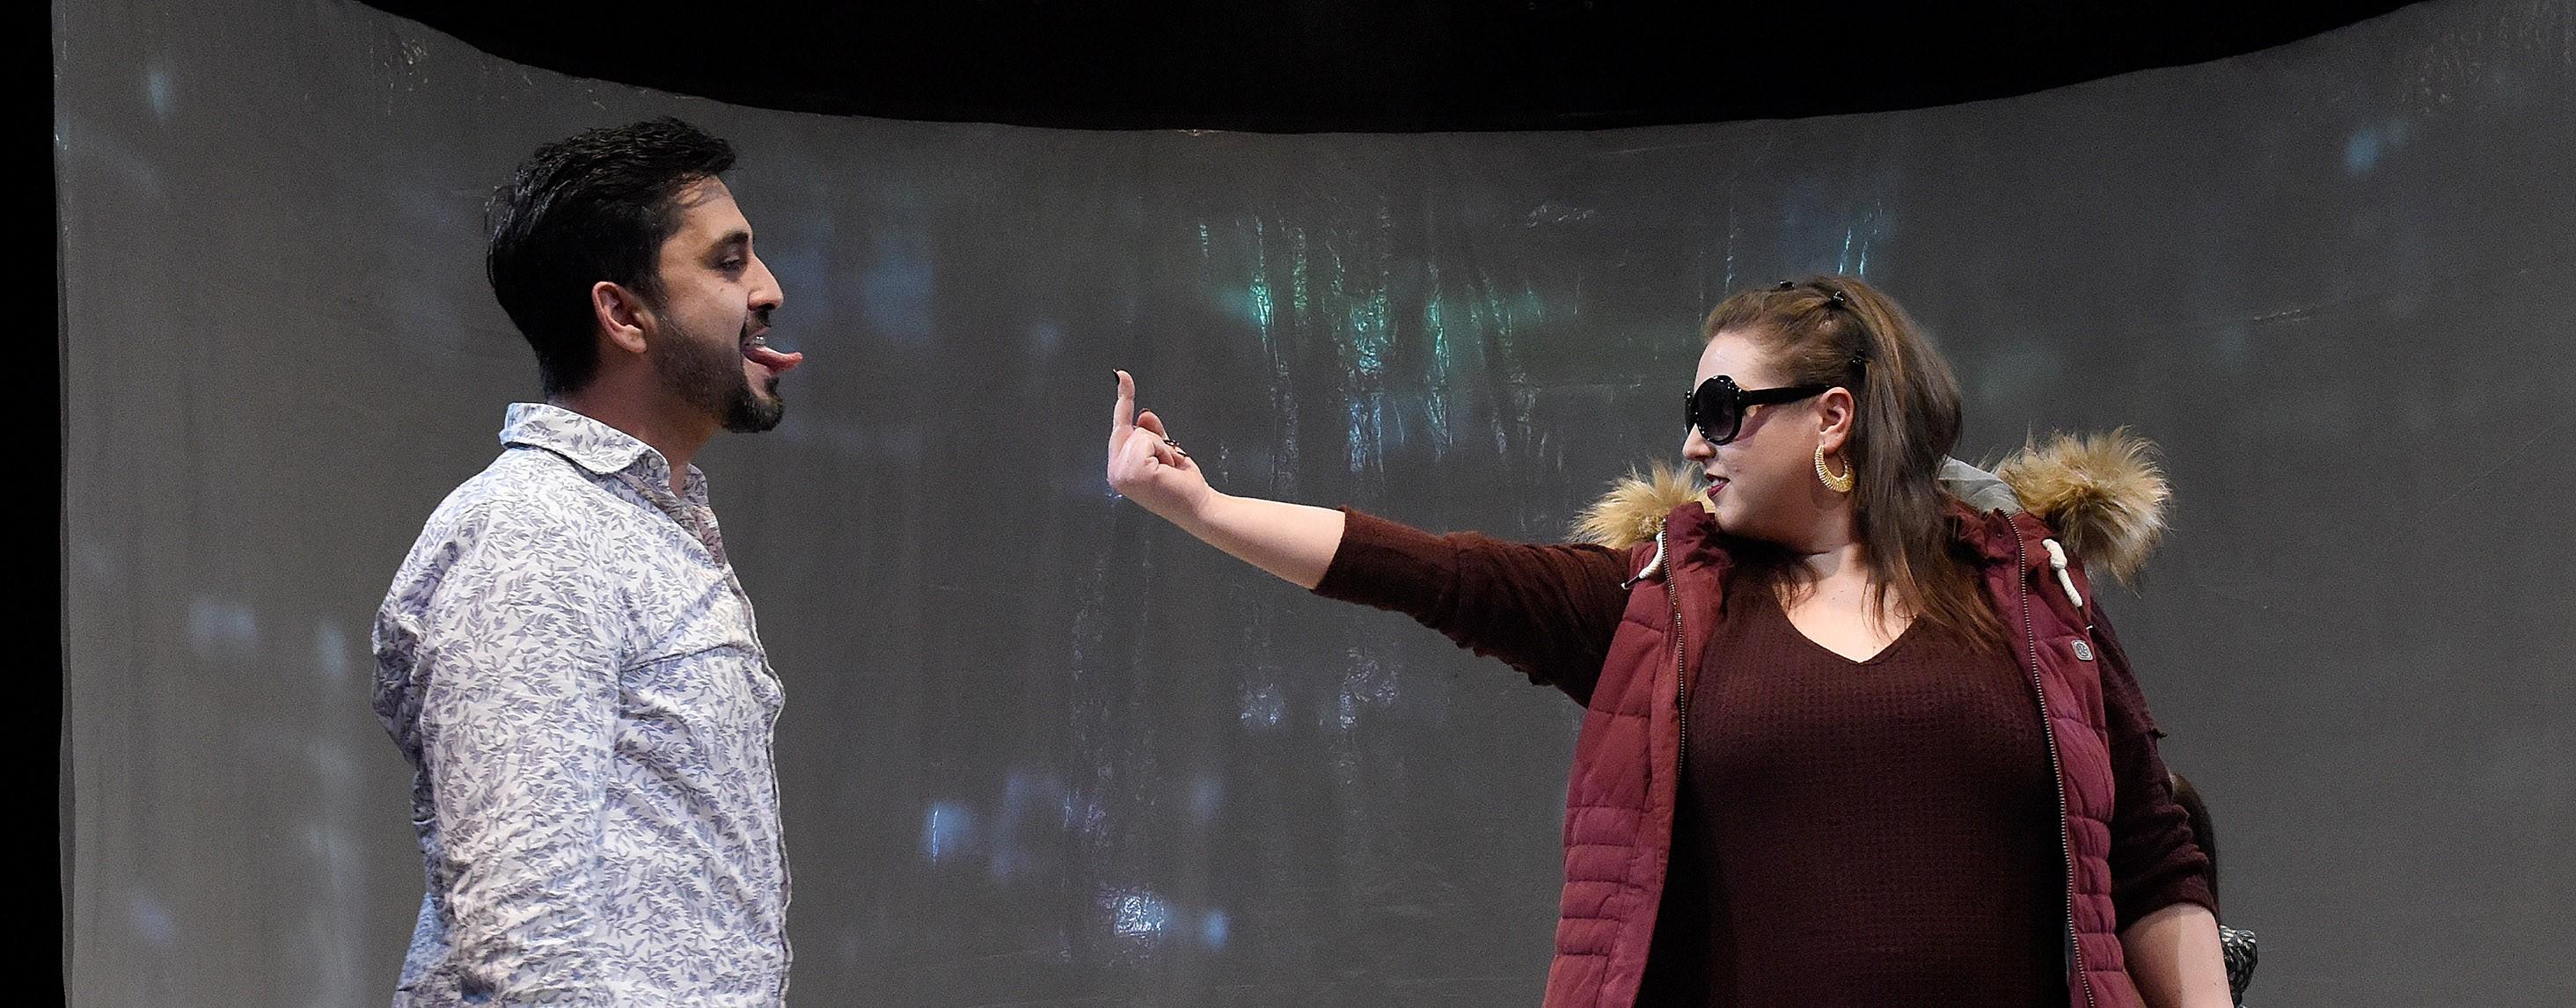 "Theaterhaus in G7: ""Nicht ohne Dich"" mit: Müjdat Yüksel, Vivien Zisack, Anna Göbel, Irina Maier, Björn Luithardt, Aaron Jeske Regie: Inka Neubert Foto Thomas Troester"